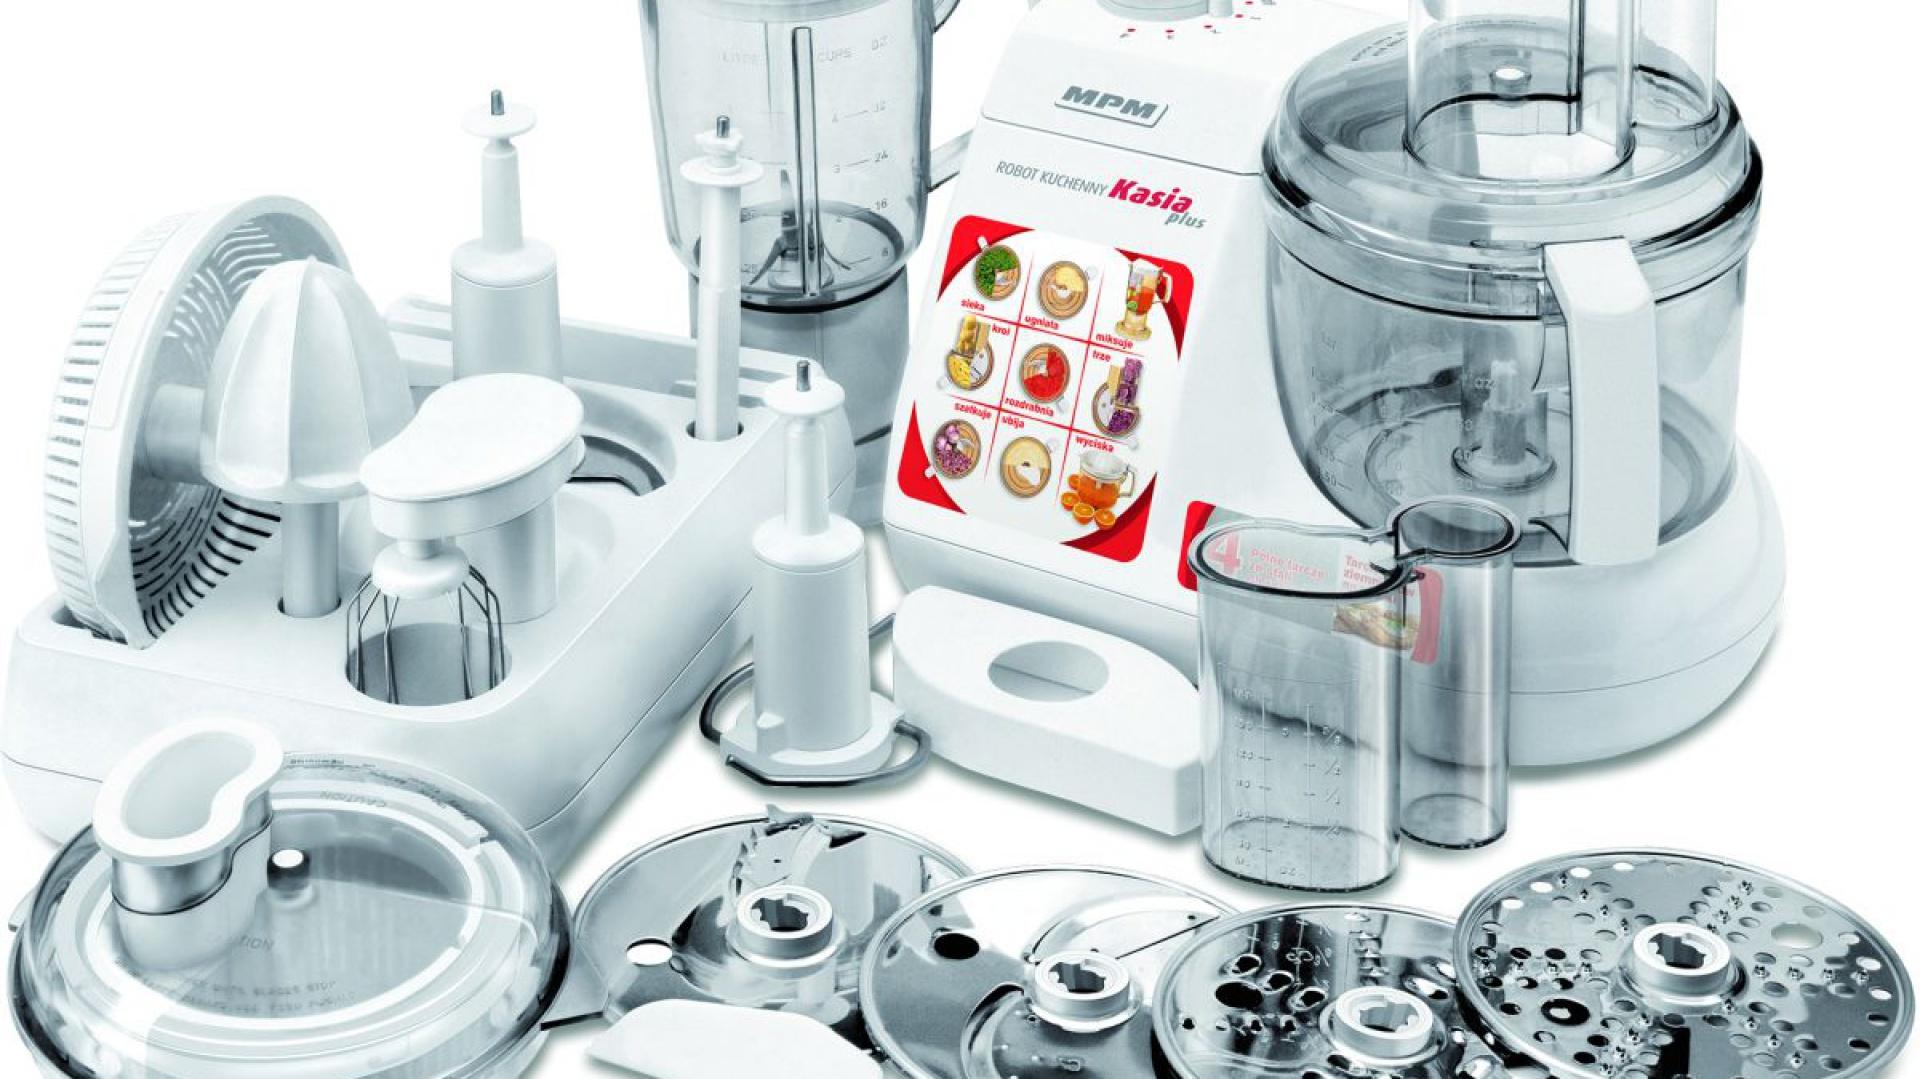 Robot kuchenny Kasia Plus MRK-11 - akcesoria